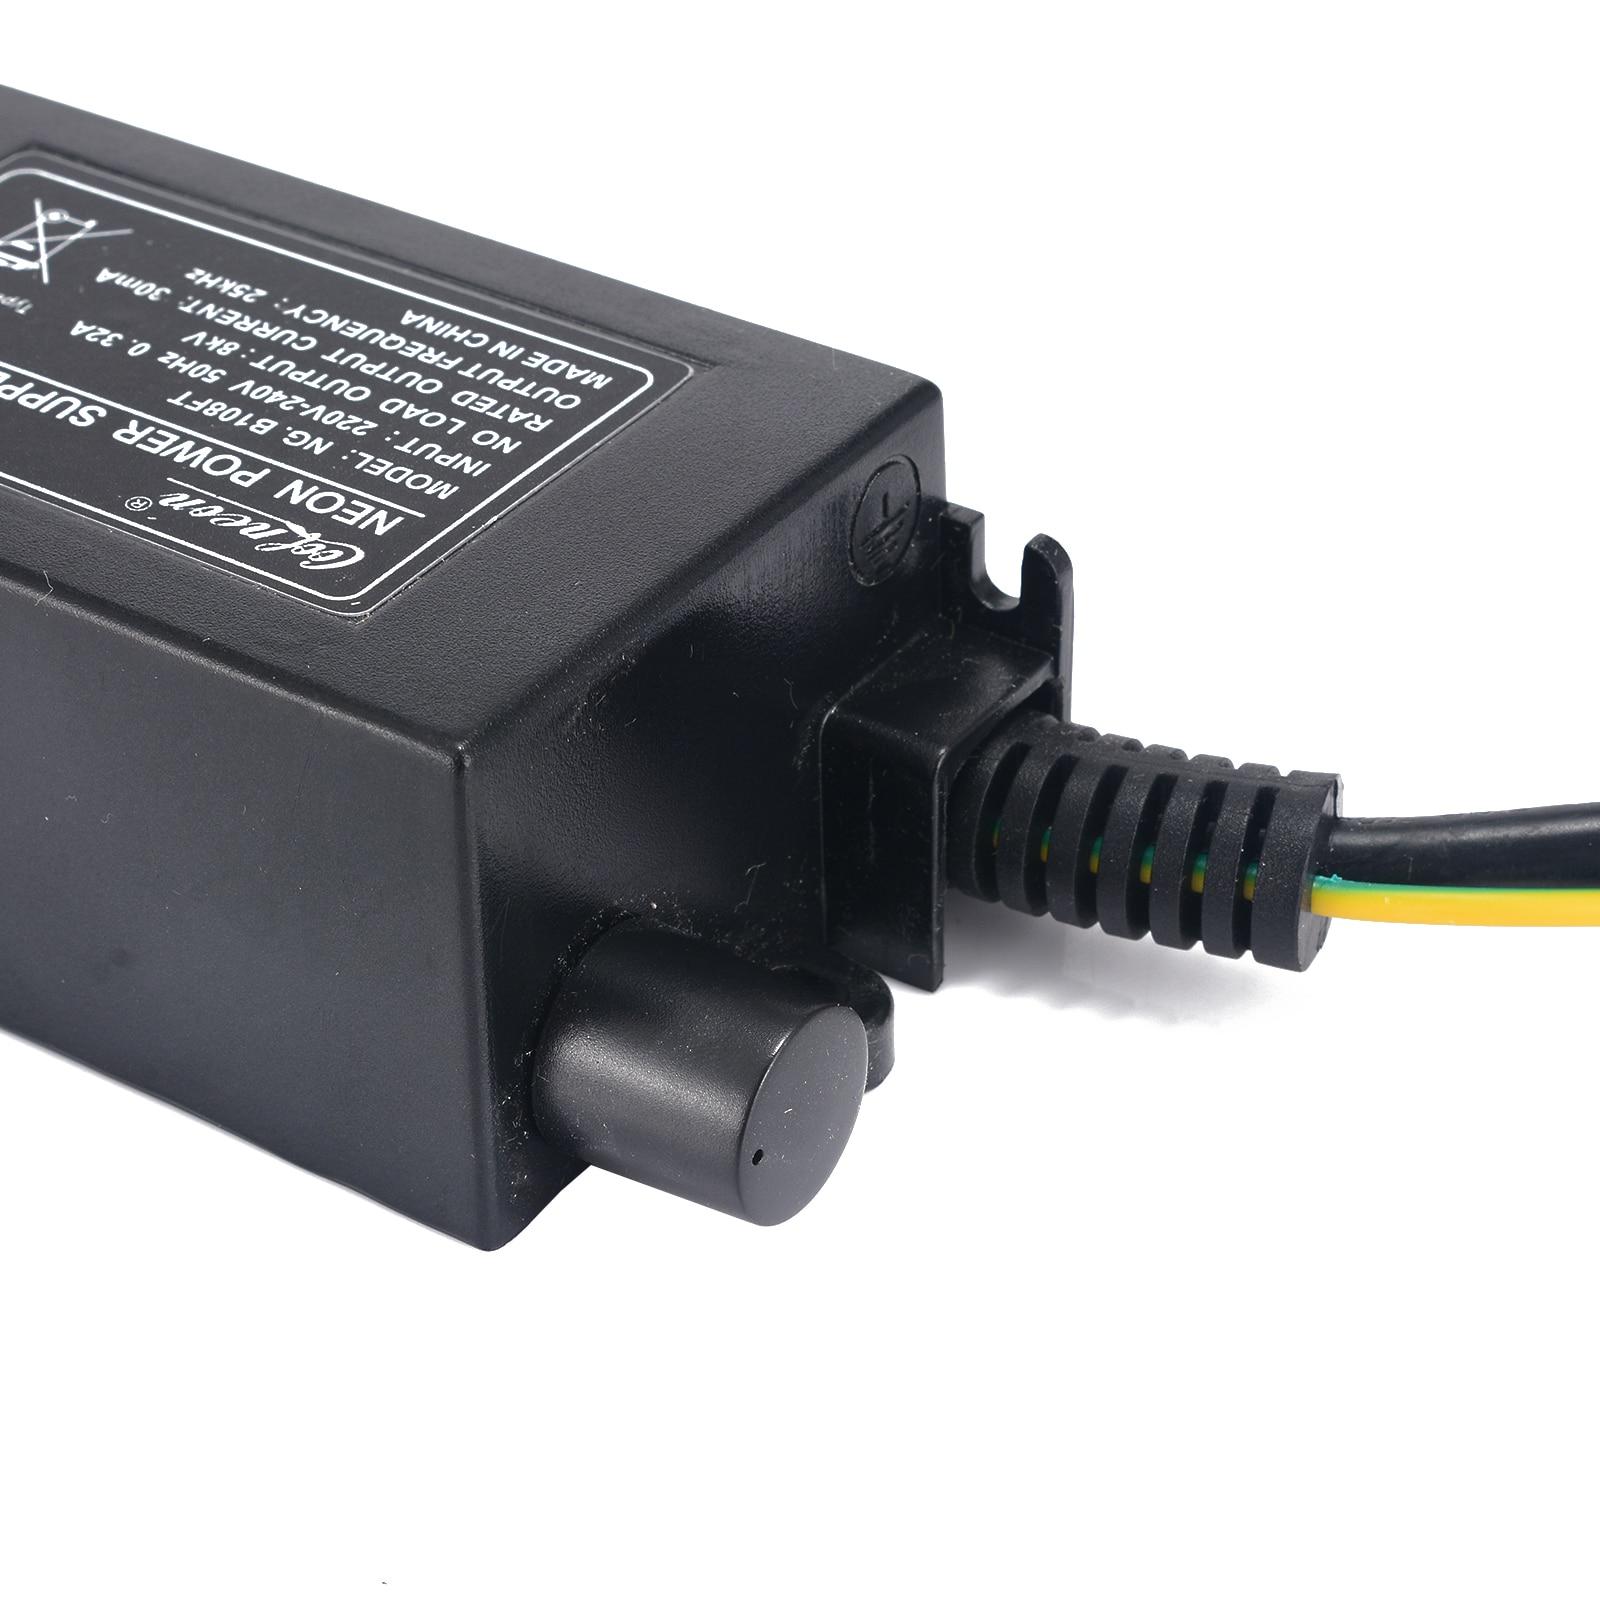 Adjustable Neon Transformer Power Supply 8KV 220V 30mA With Dimmer Neon Ballast EU Plug